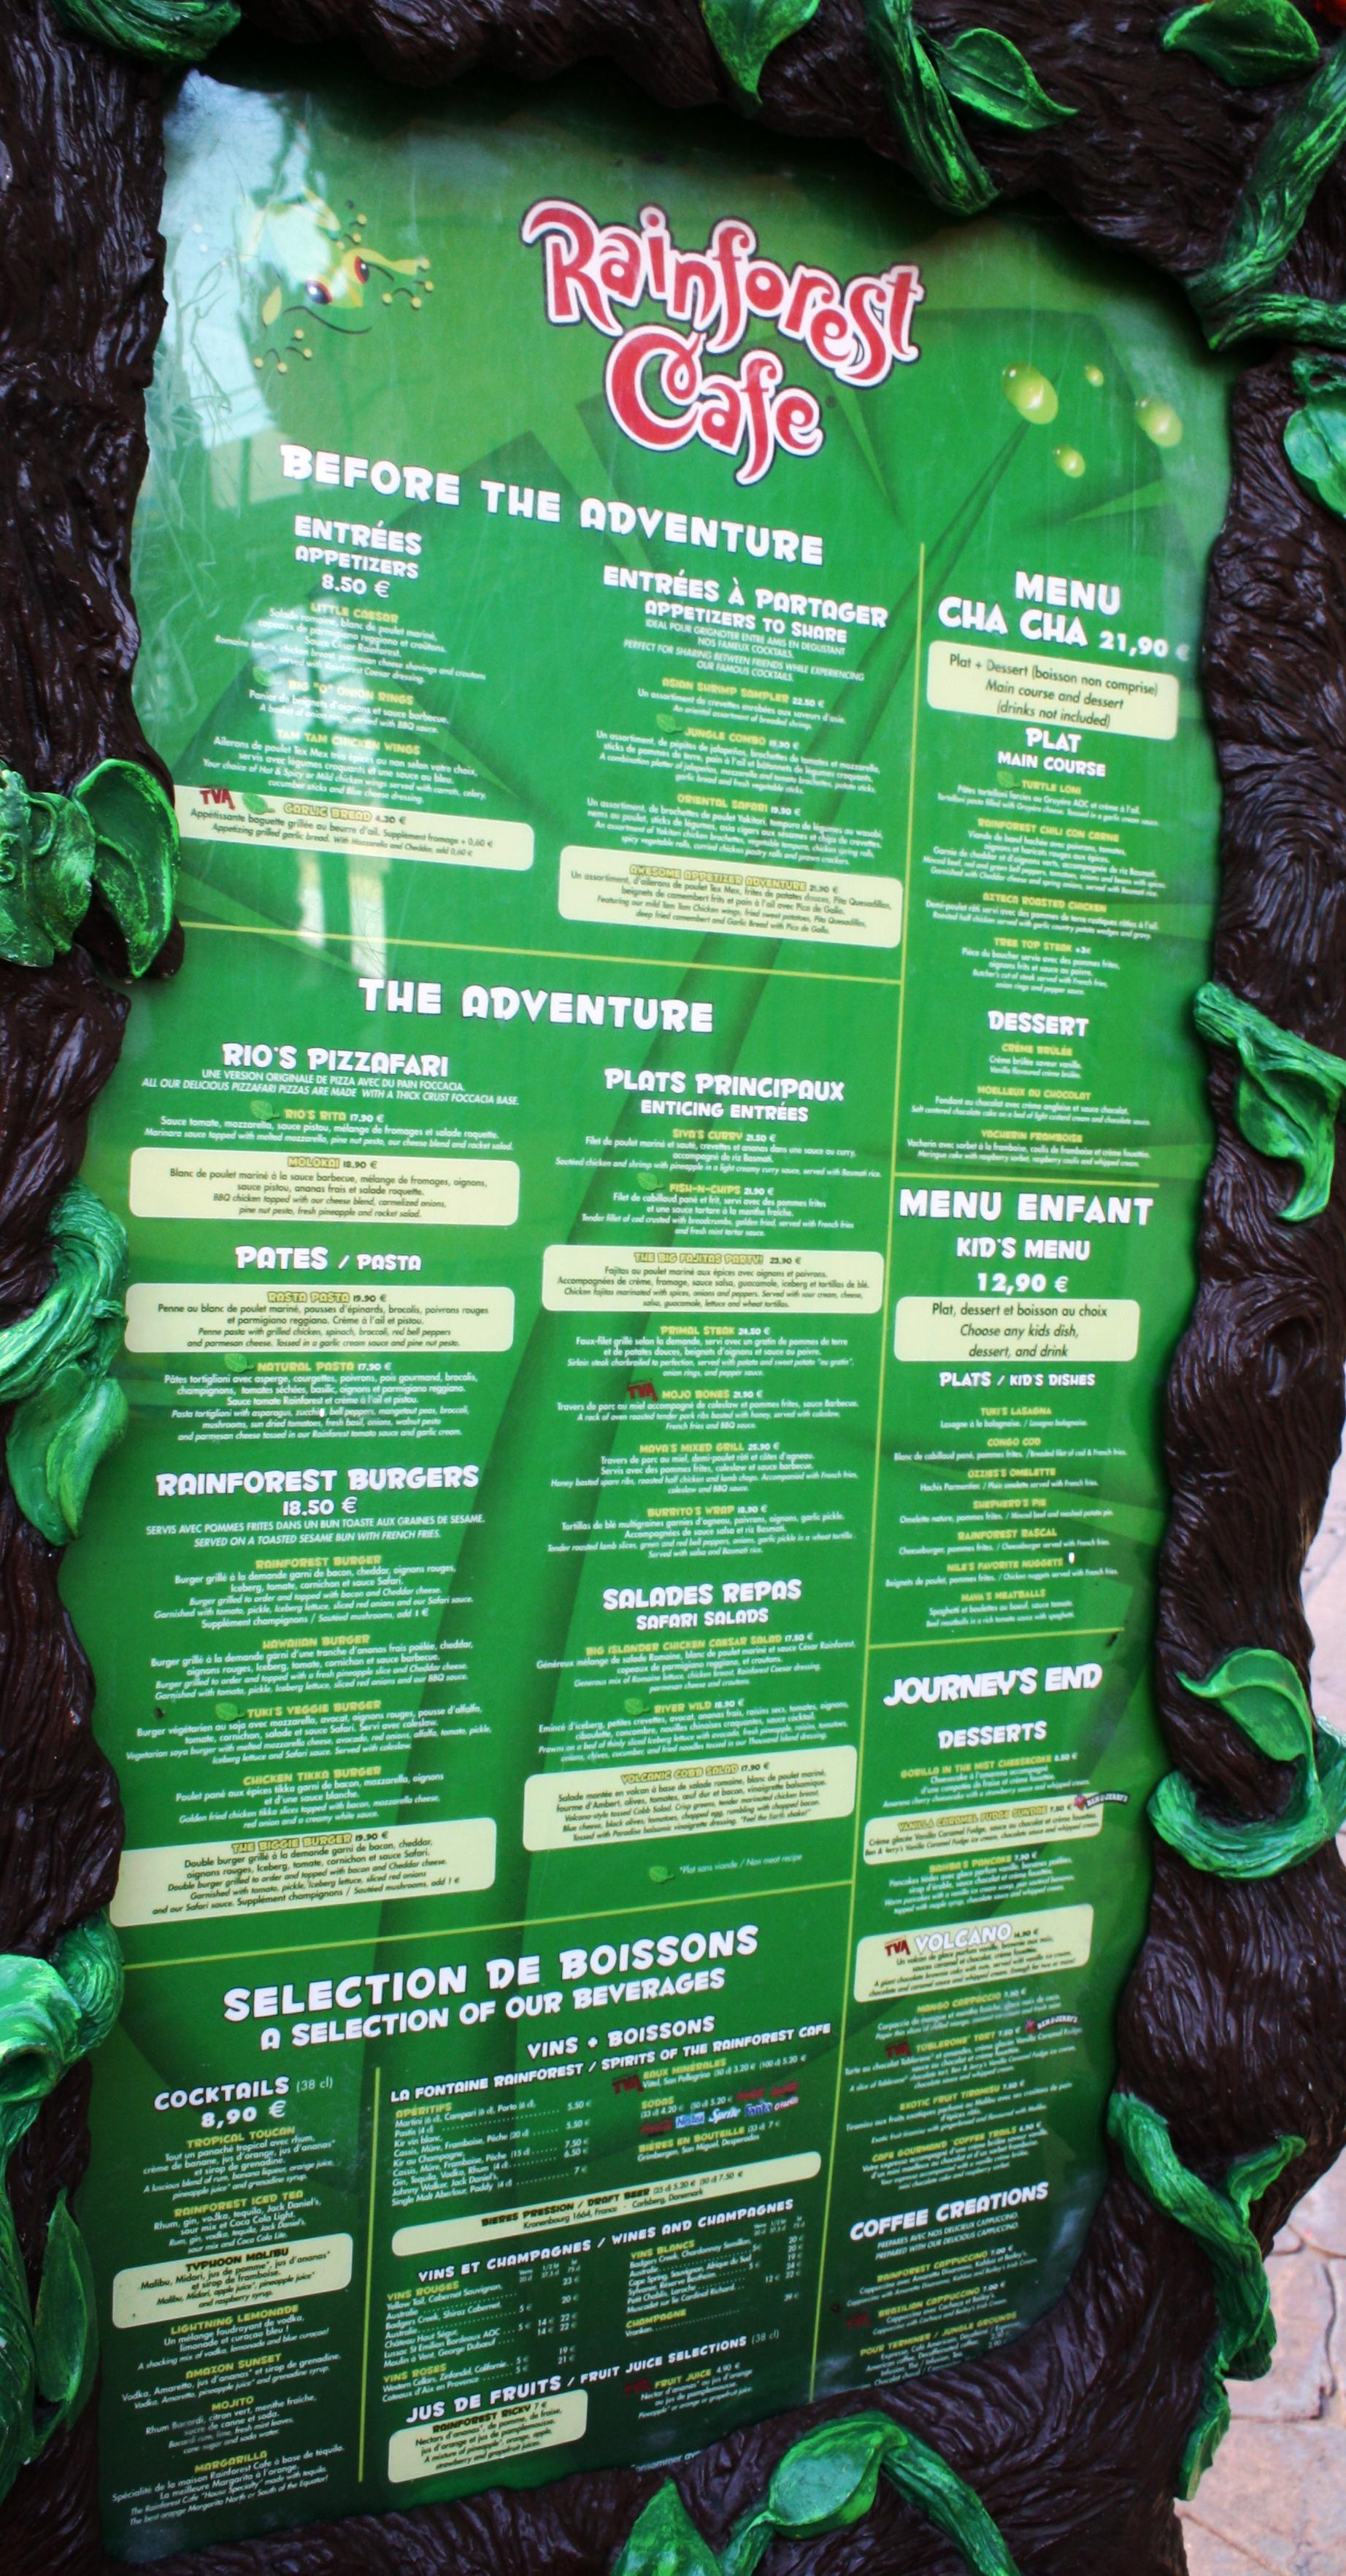 Rainforest Caf 233 Disney Village Disneyland Paris Parce